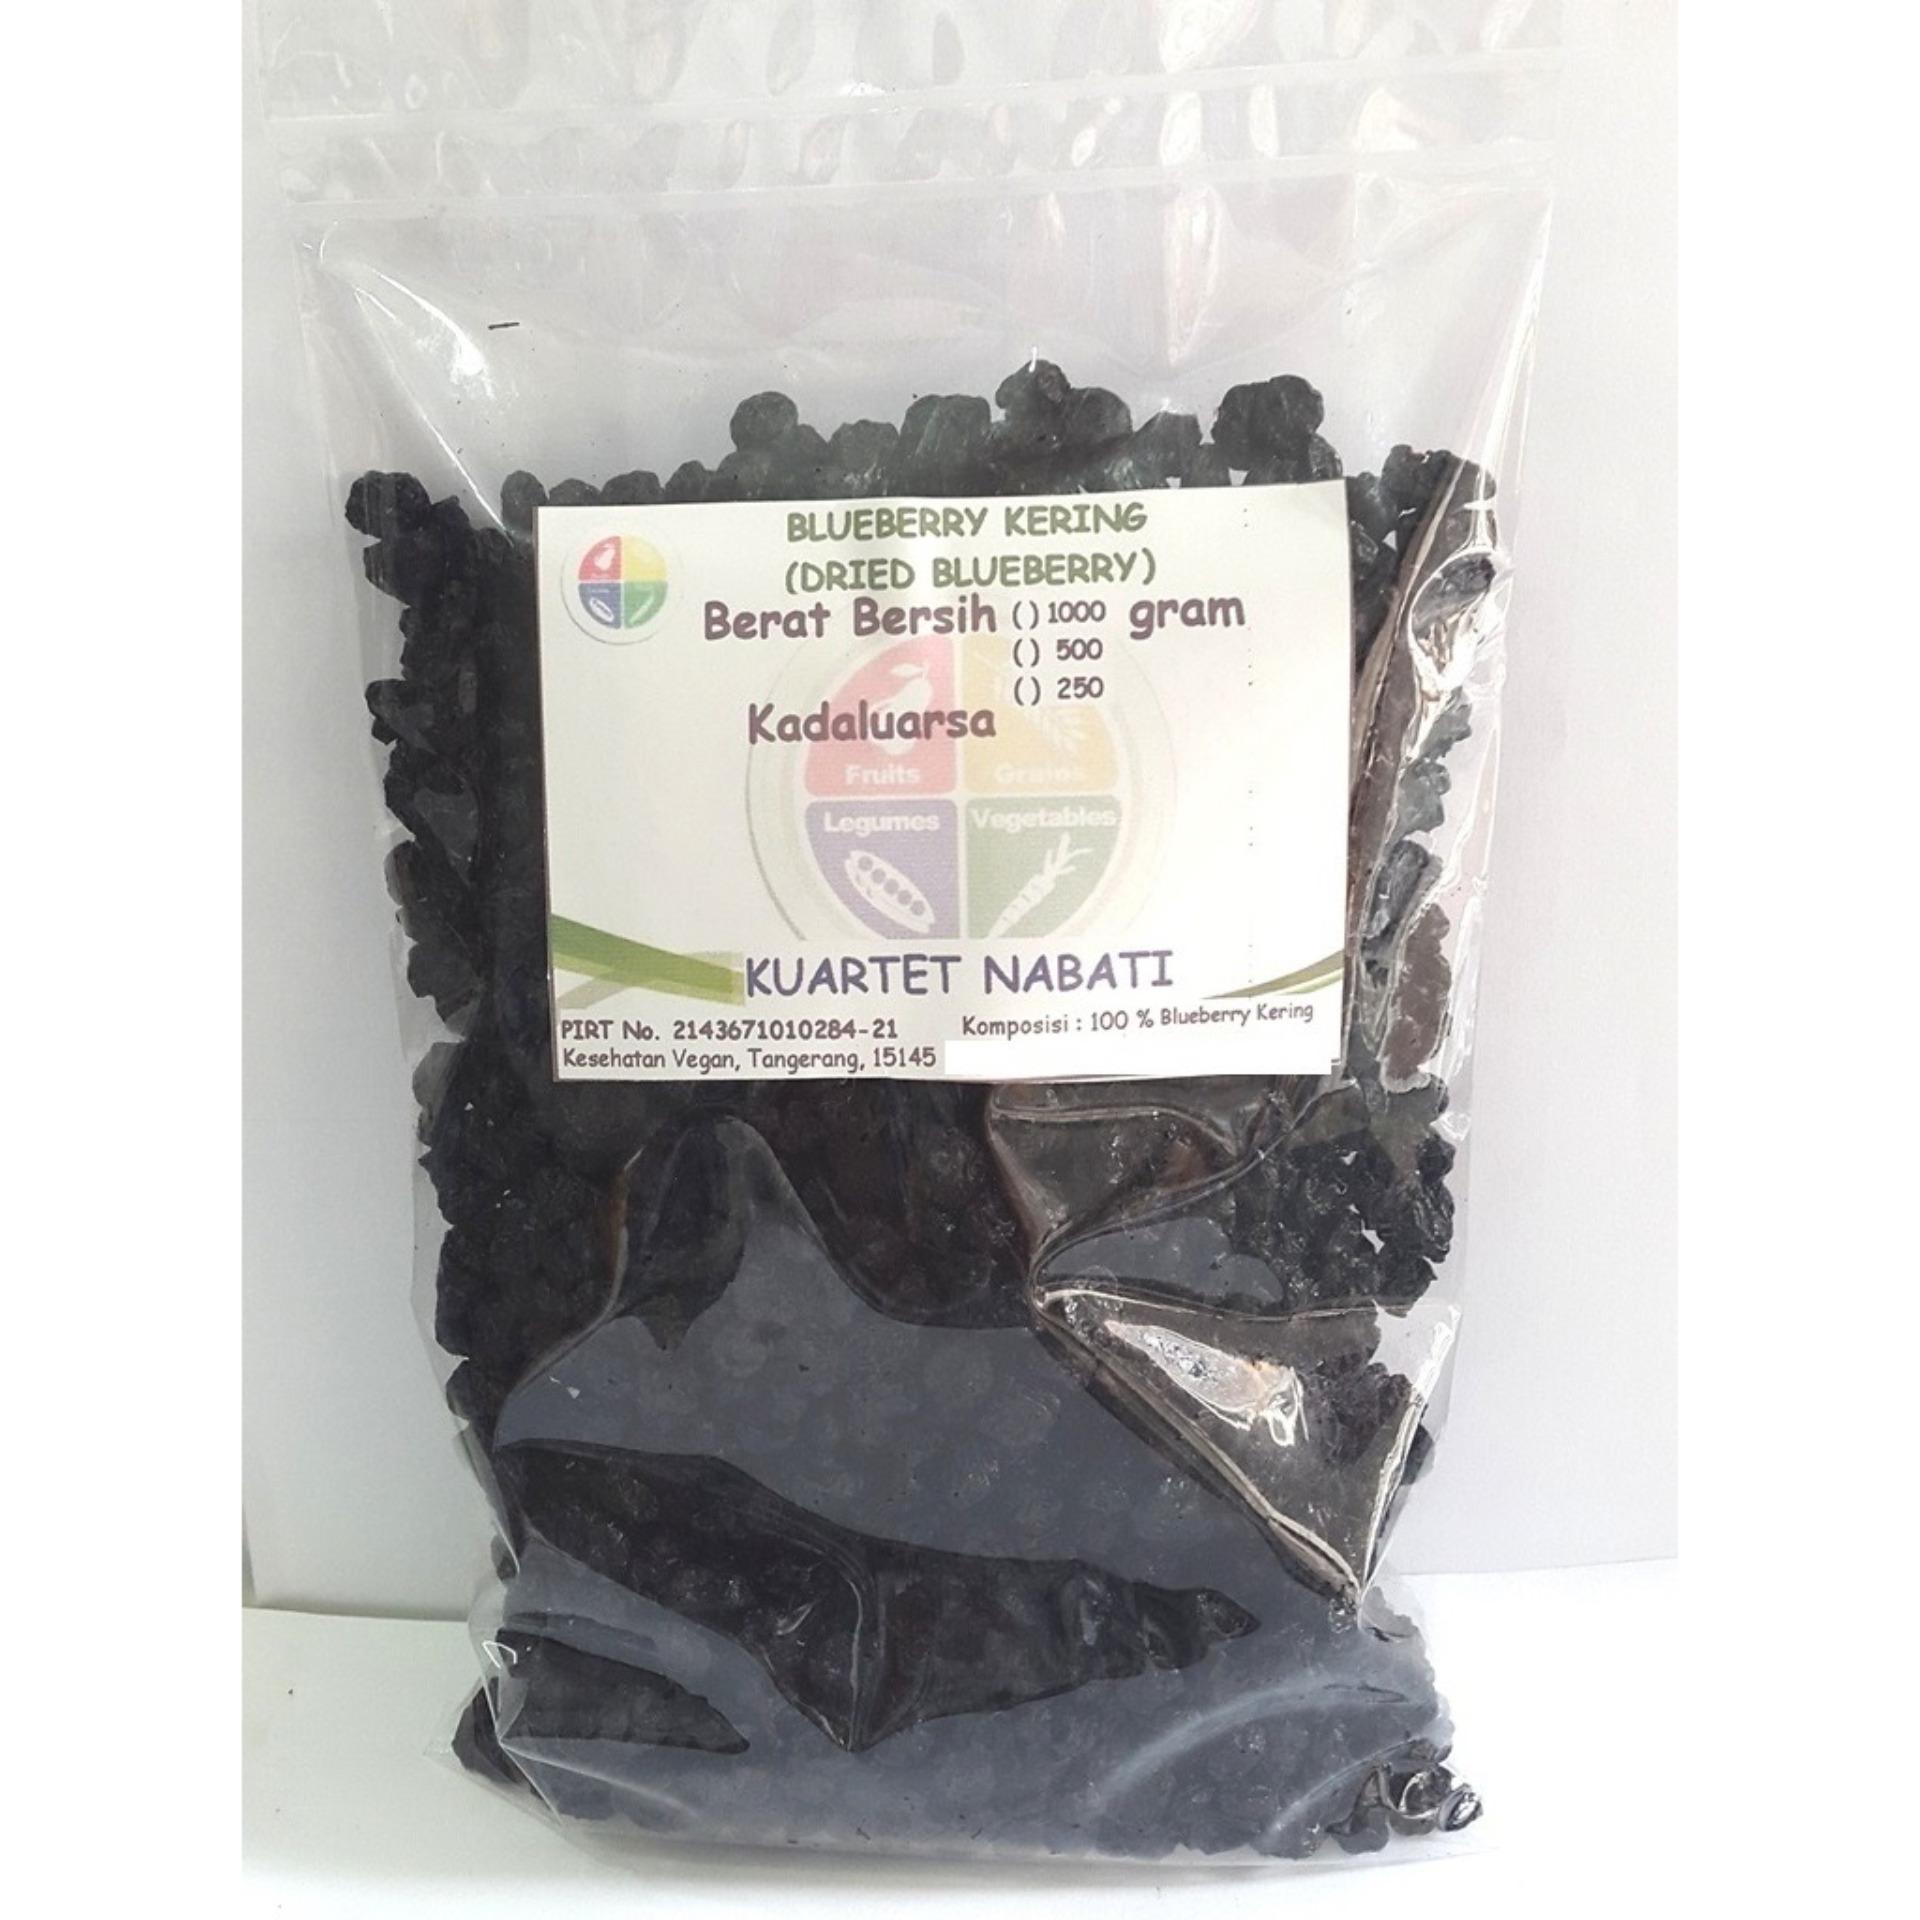 Harga Jual Termurah Hbt Colata Glaze Donut 250gr Dark Coklat Terbaru Source · Kuartet Nabati Blueberry Kering Dried Blueberry 500 Gr